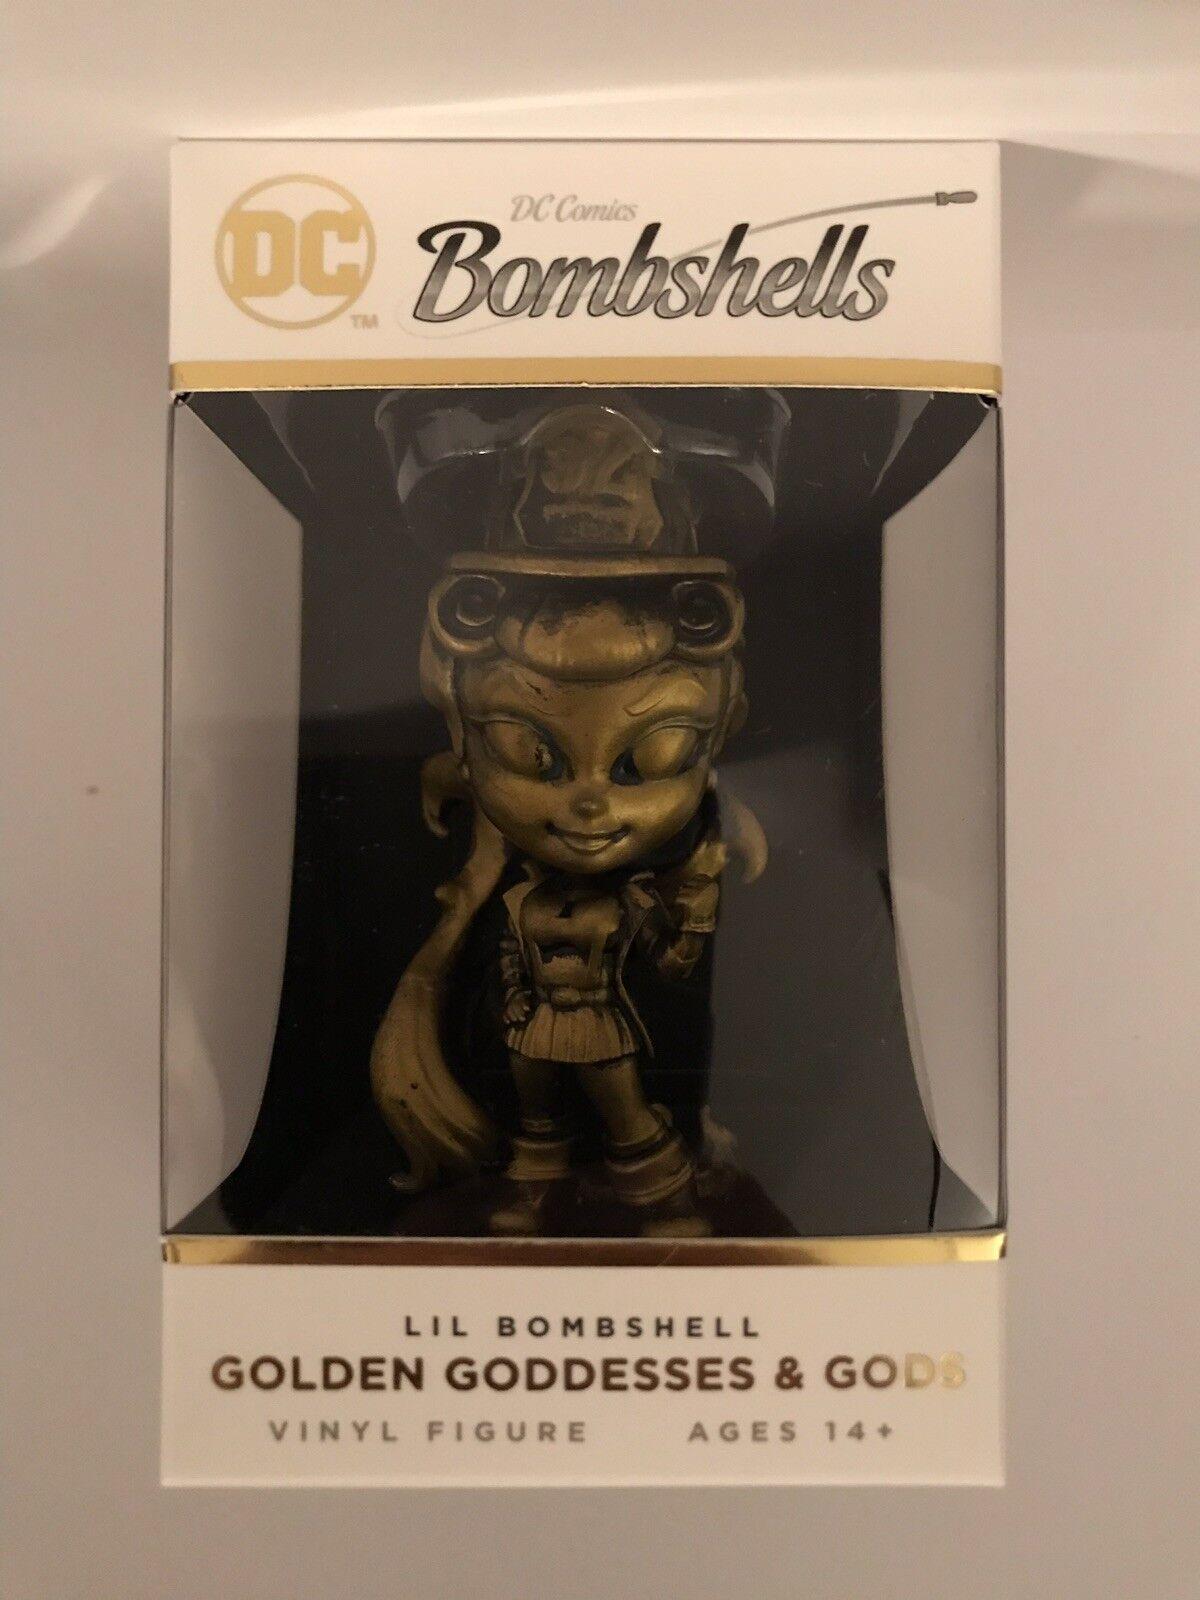 Dc comics bombshells 2 sternenfeuer bronze lil bombshells vinyl - figur